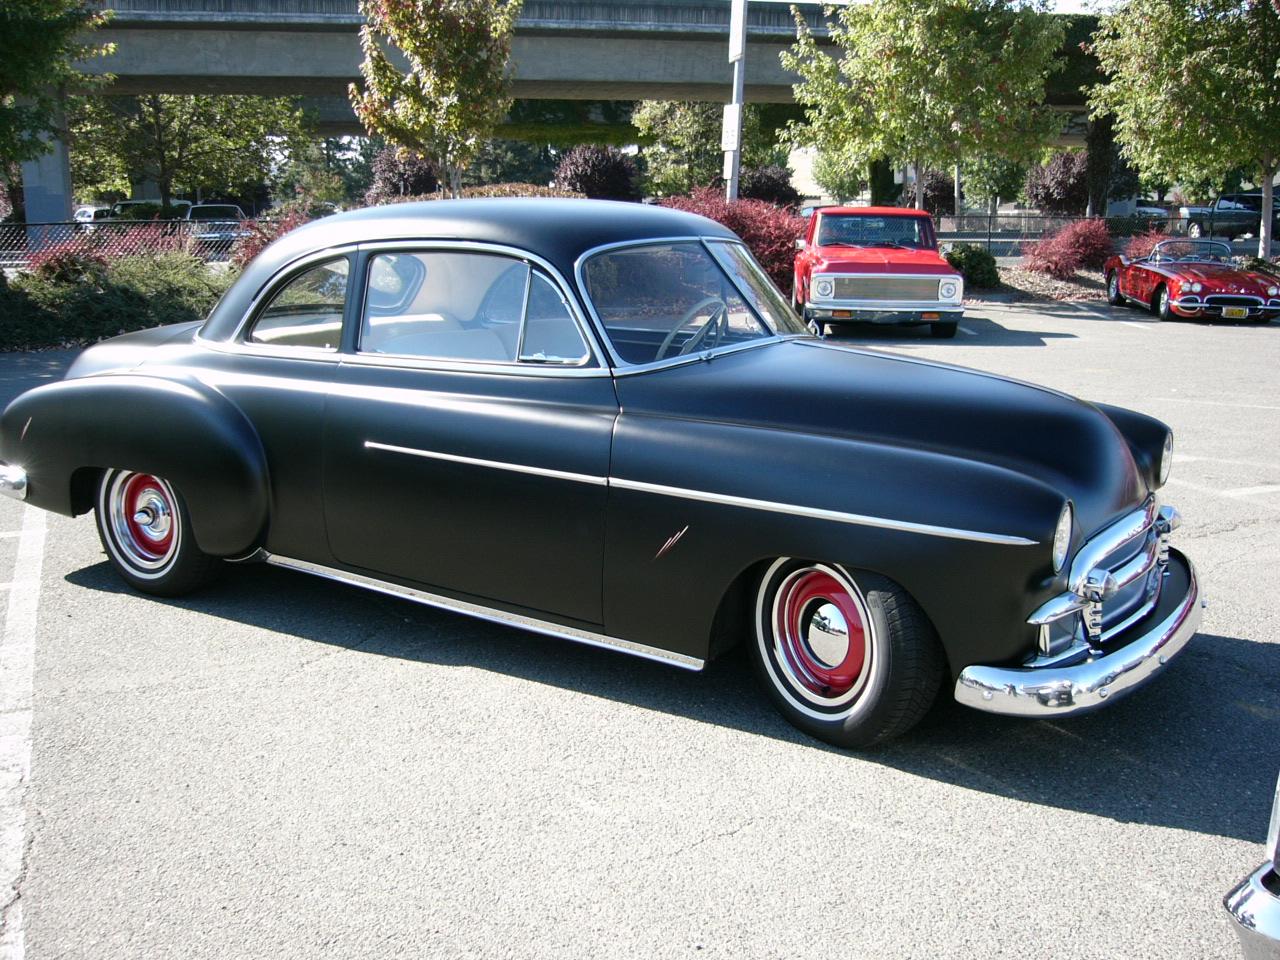 1950 chevrolet 2 door sedan by roadtripdog on deviantart for 1950 ford sedan 2 door